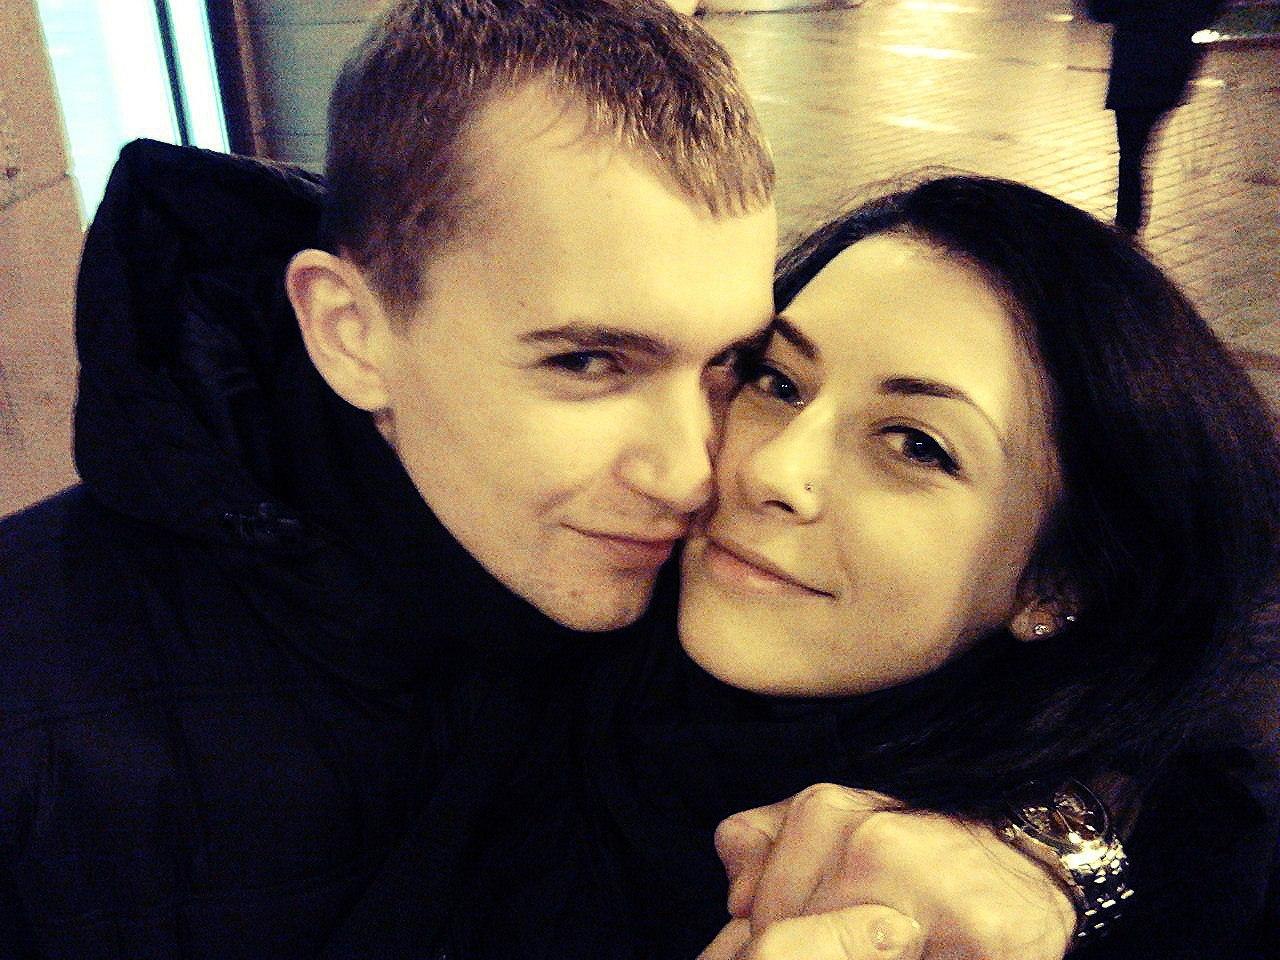 Митя + Лена = «Это Наши Дети» 7